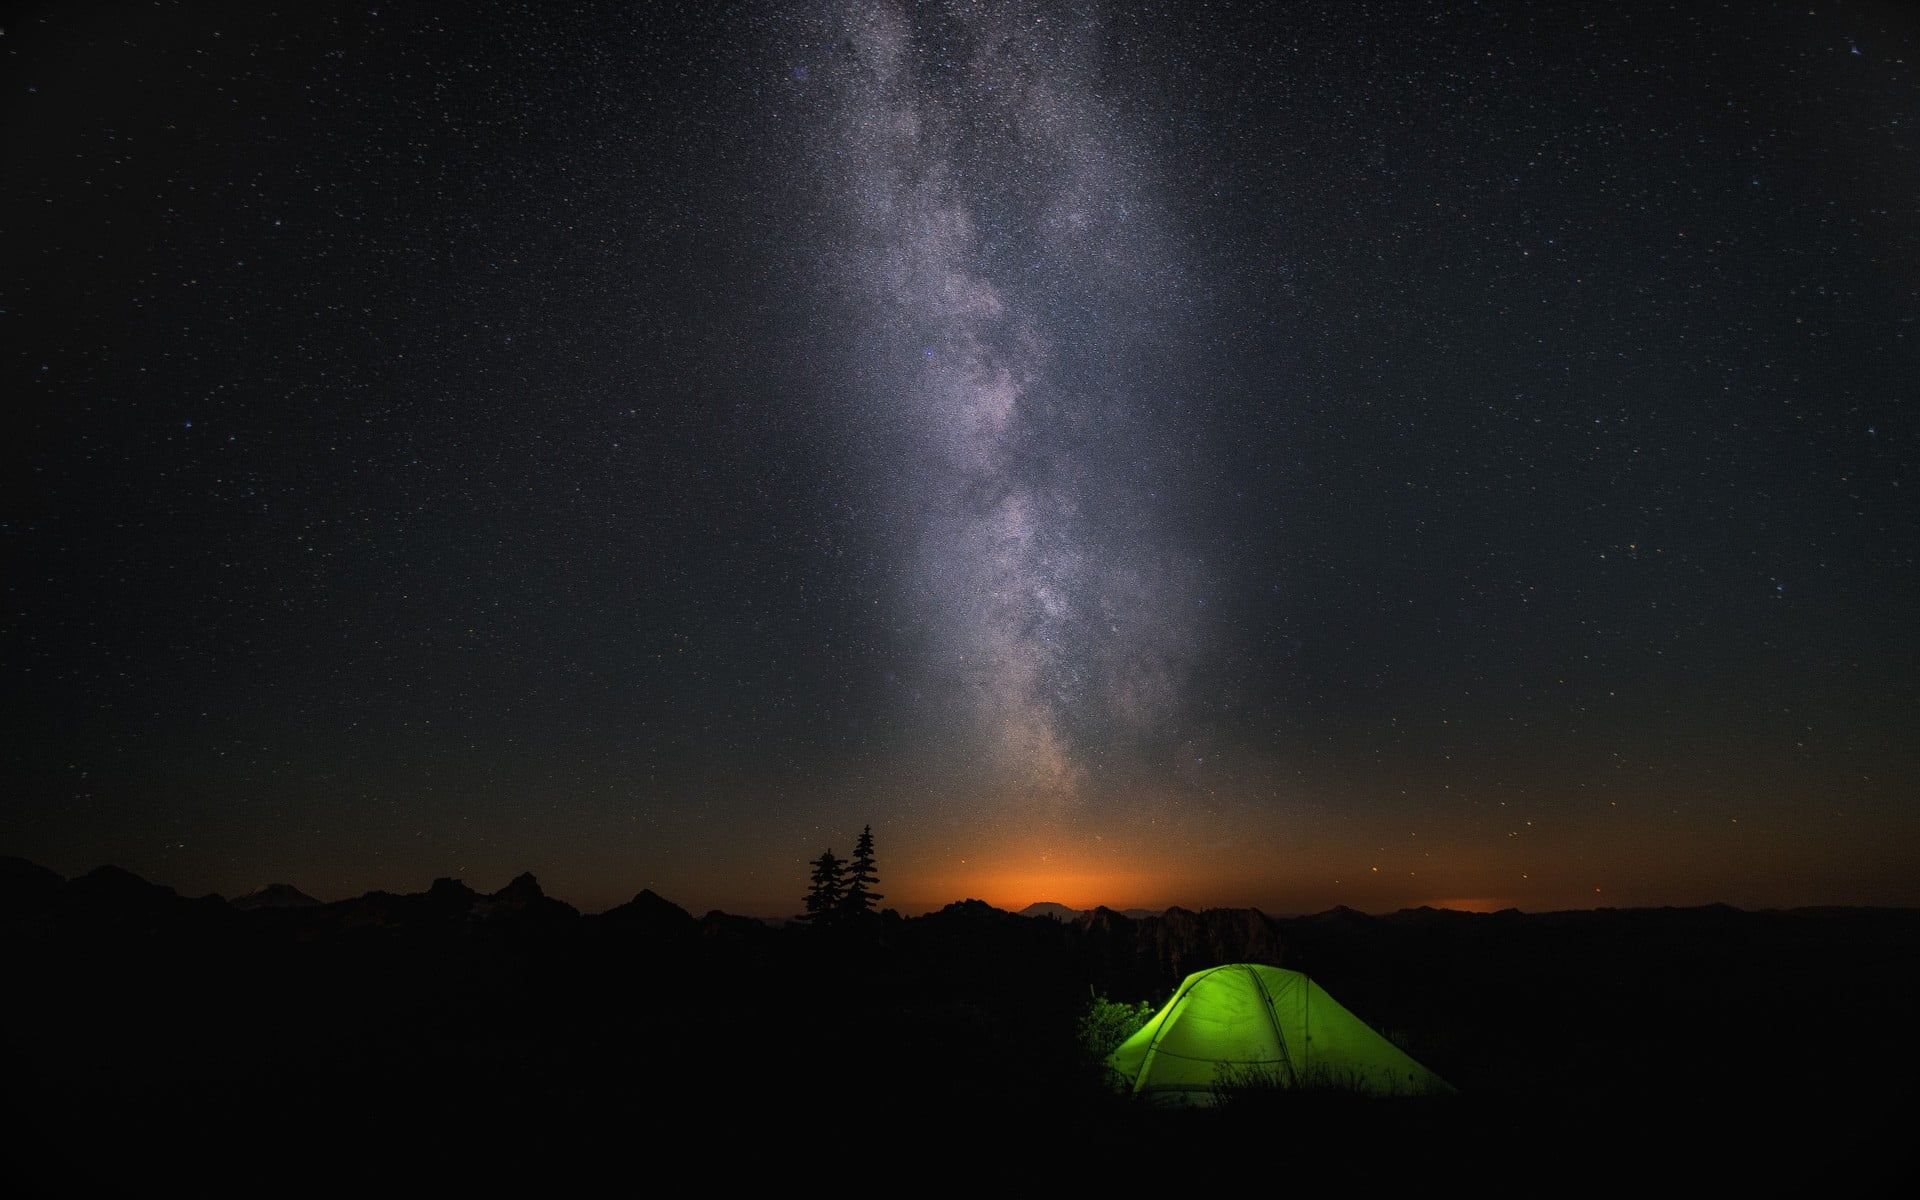 Green Outdoor Camping Tent Microsoft Windows Windows 10 Galaxy Tent Night Nature 1080p Wallpaper Hdwallpap Camping Wallpaper Landscape Wallpaper Outdoor